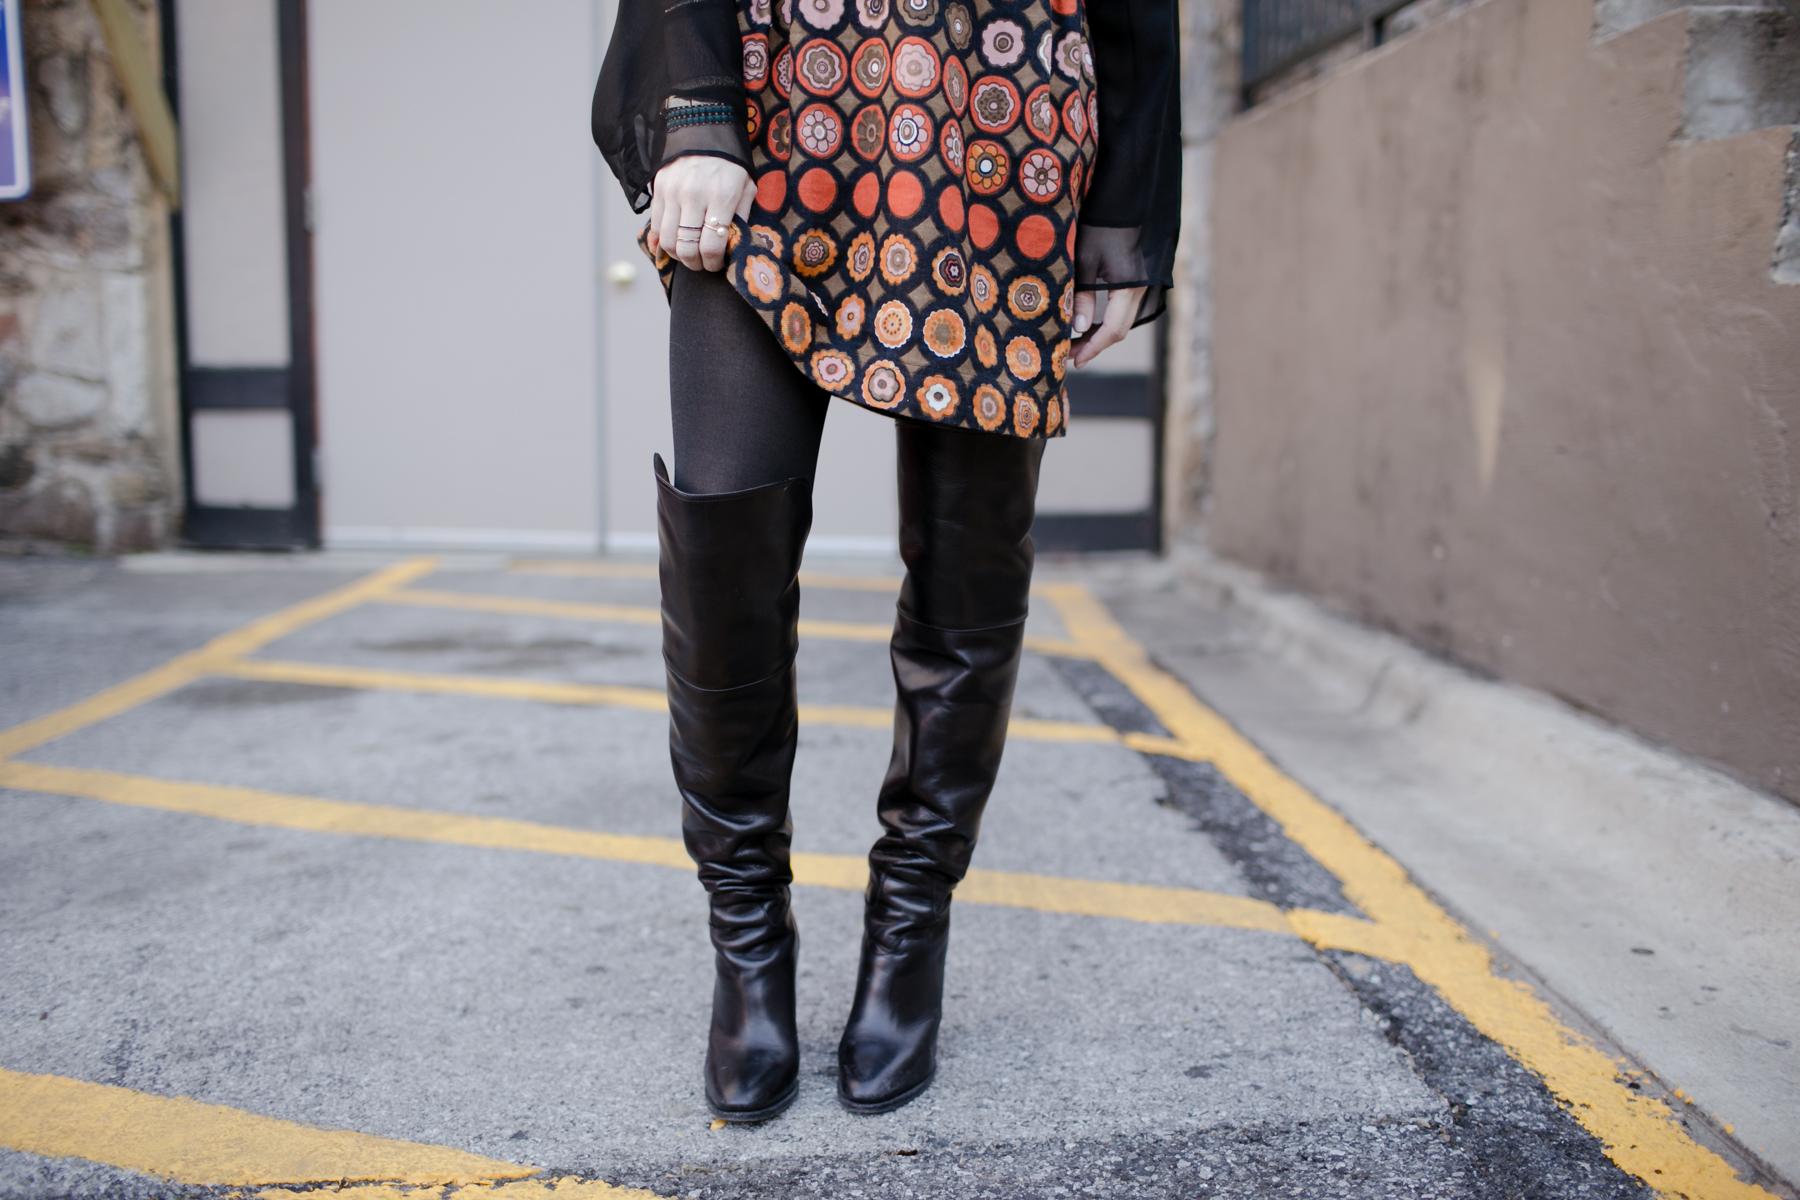 Eldridge Edit_Anna_E_Cottrell_Tulip_Louise_Fashion_Blogger_Chloe_Dress_seventies_Ralph_Lauren_Over_The_Knee_Boots_Black_10.jpg